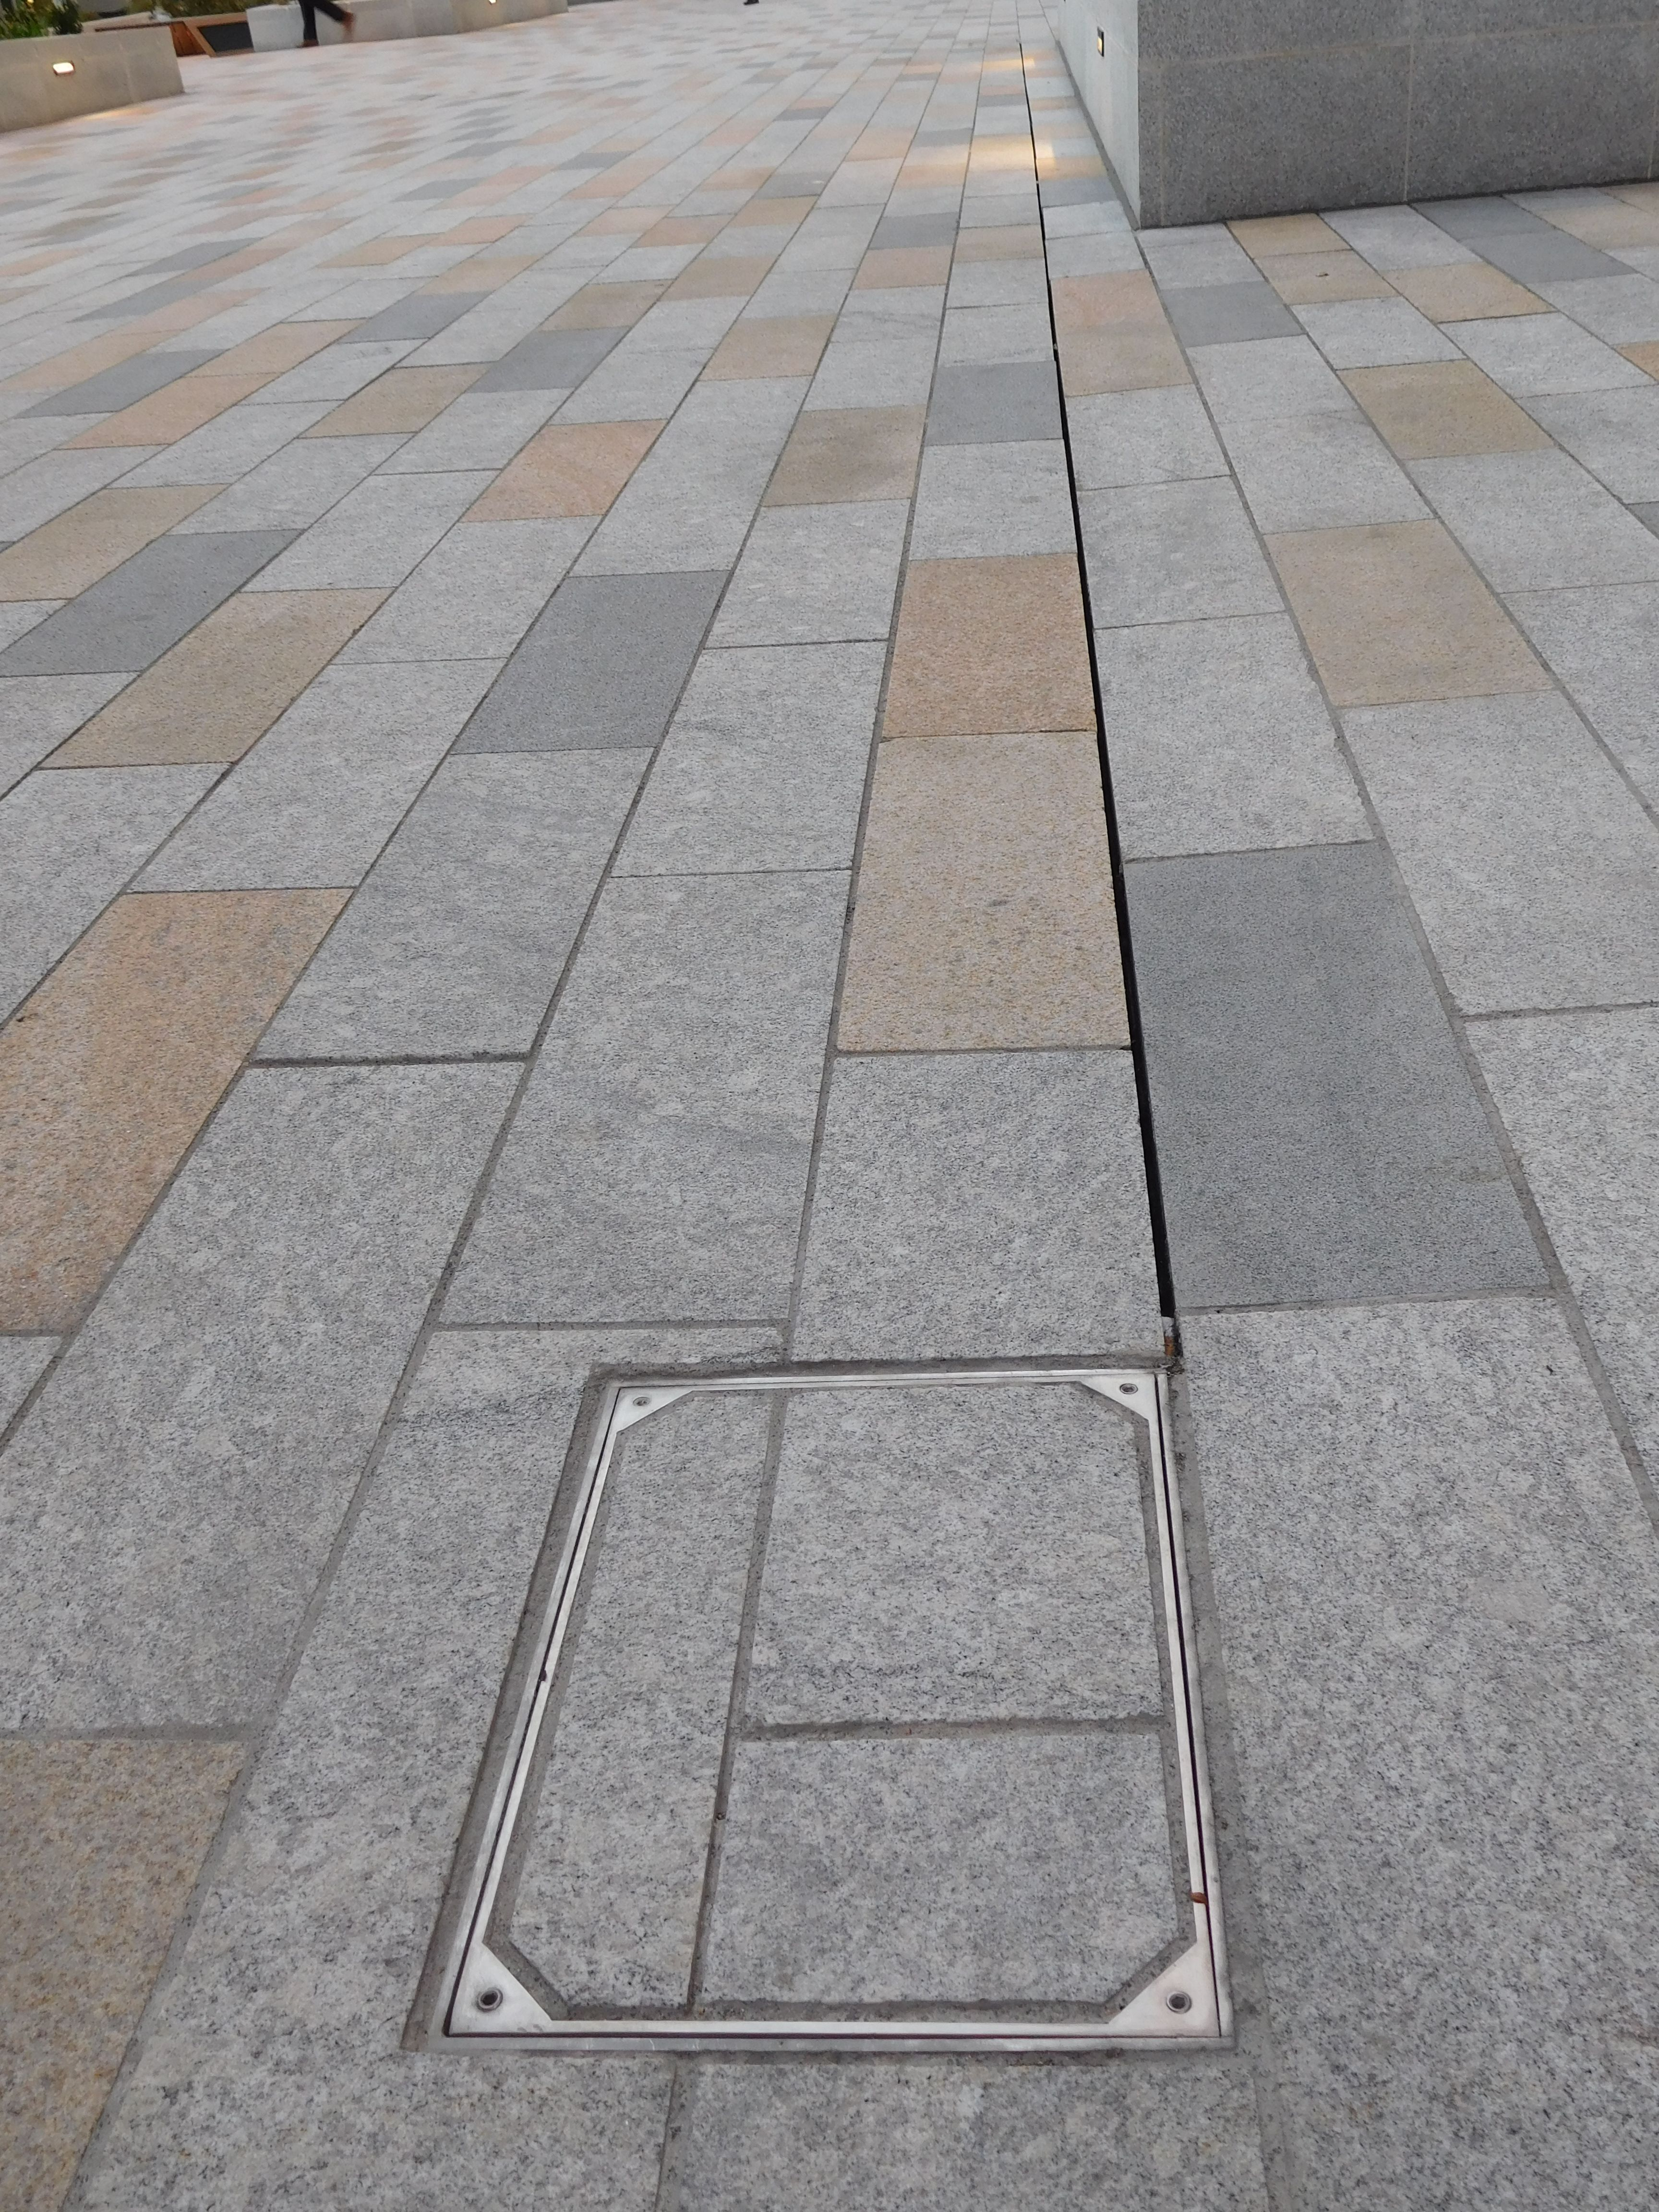 Thomas More Square Slot Drain Floor Drains Courtyard Design Outdoor Tiles